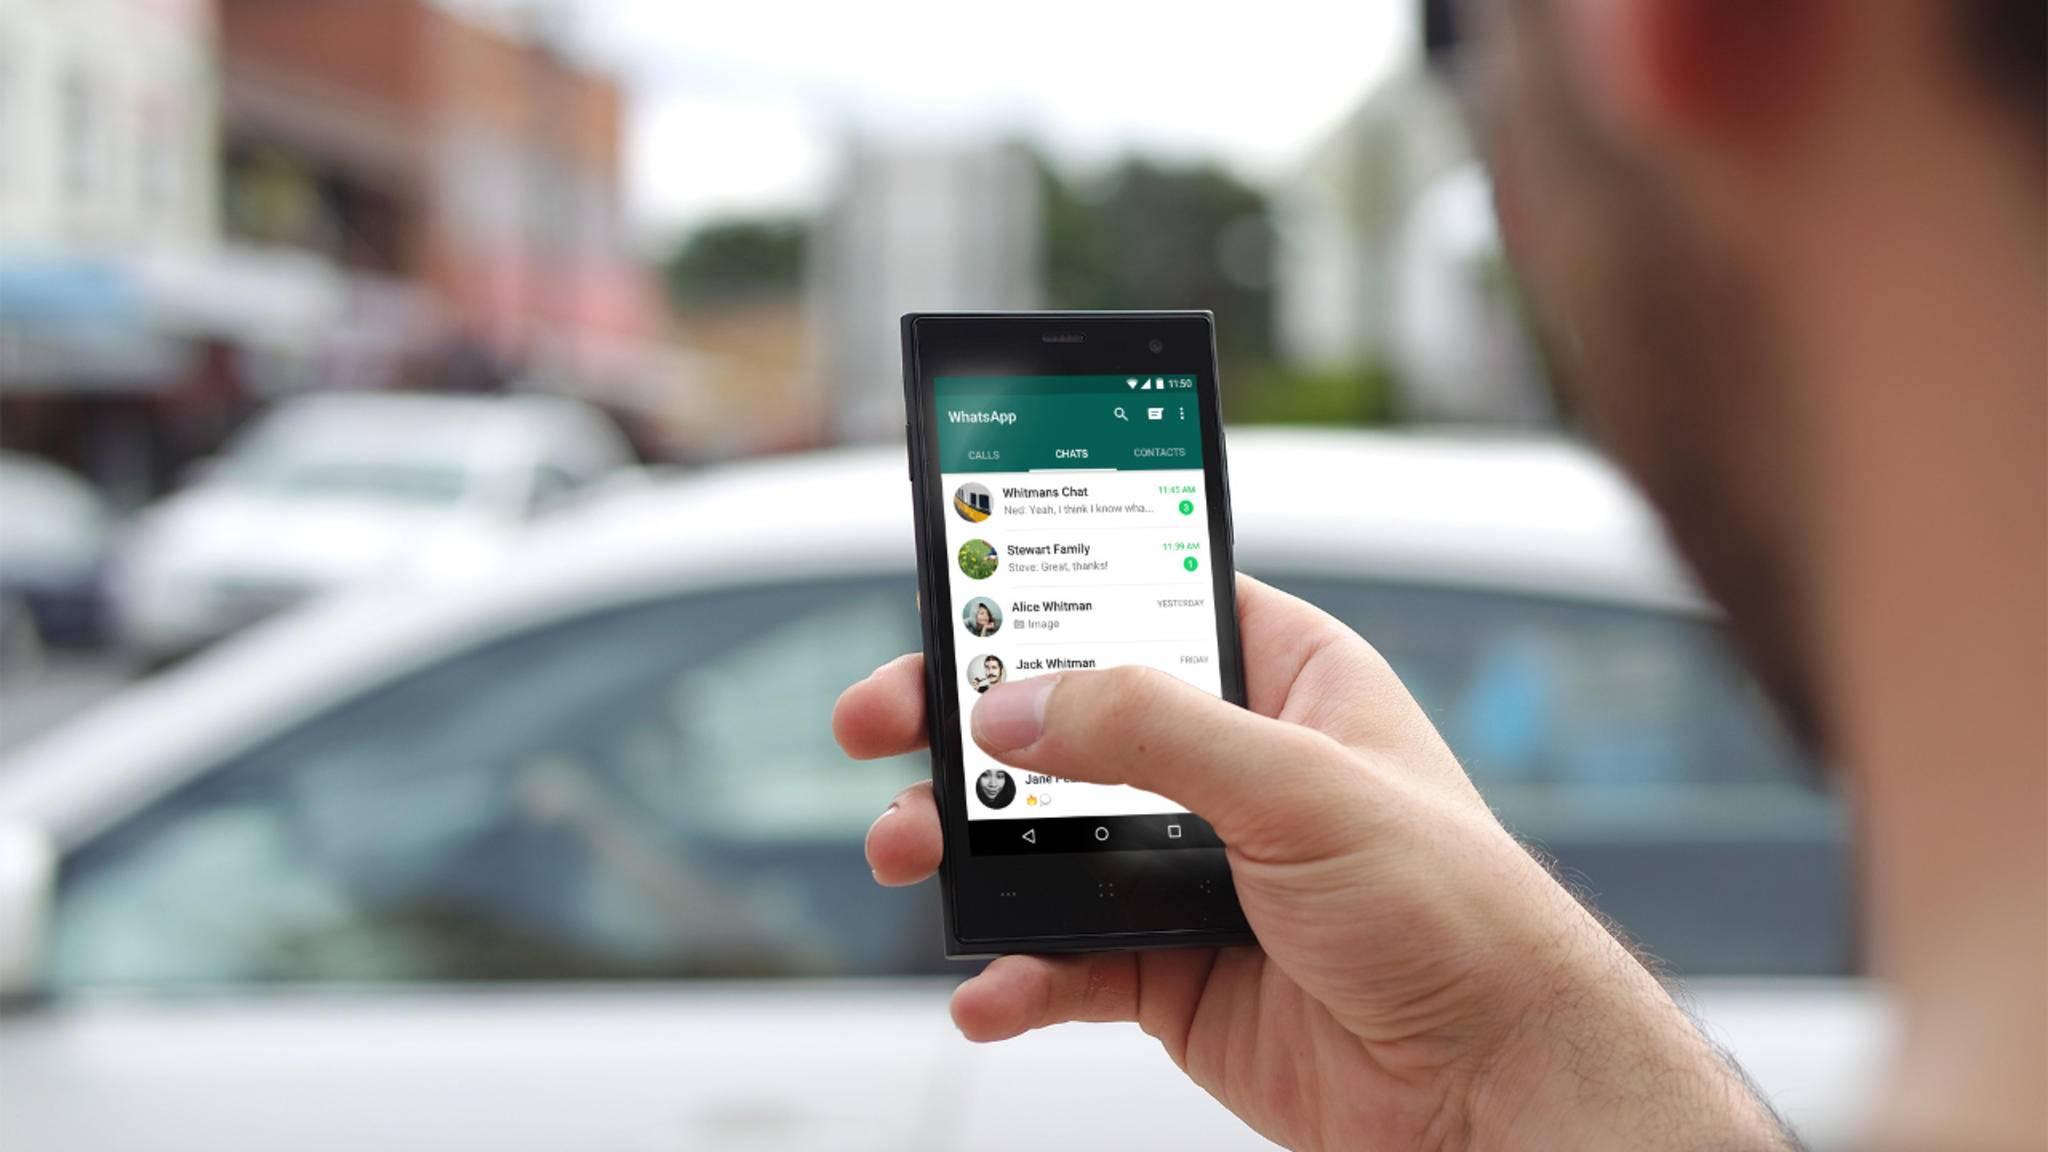 Whatsapp online status falsch iphone  Track When Your